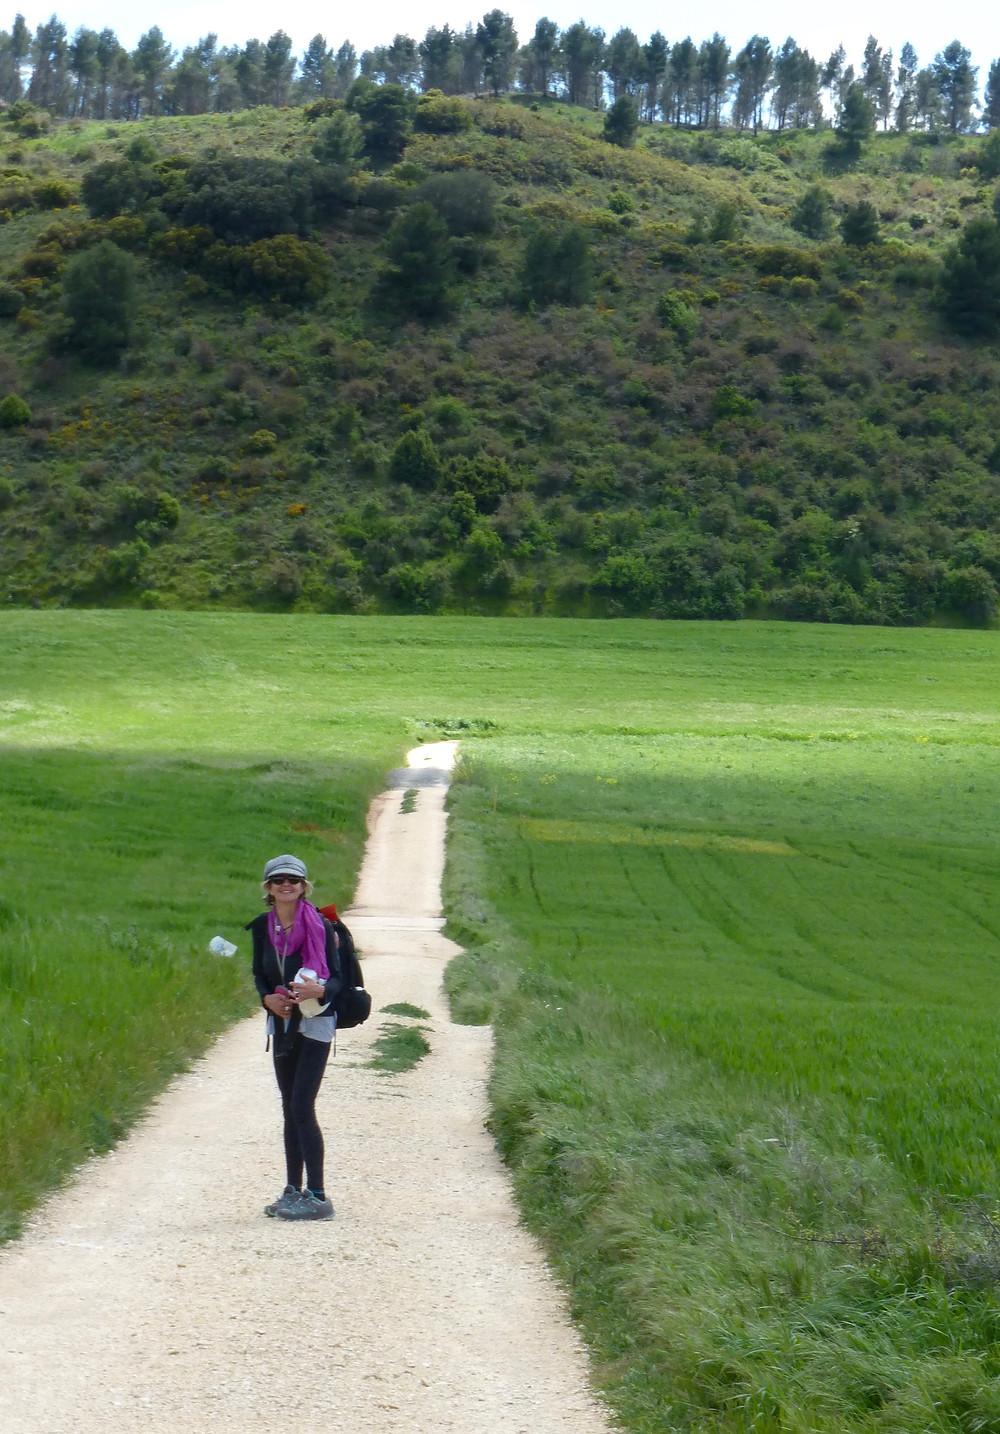 Meditative trail Spain, Camino de Santiago, Peregrino